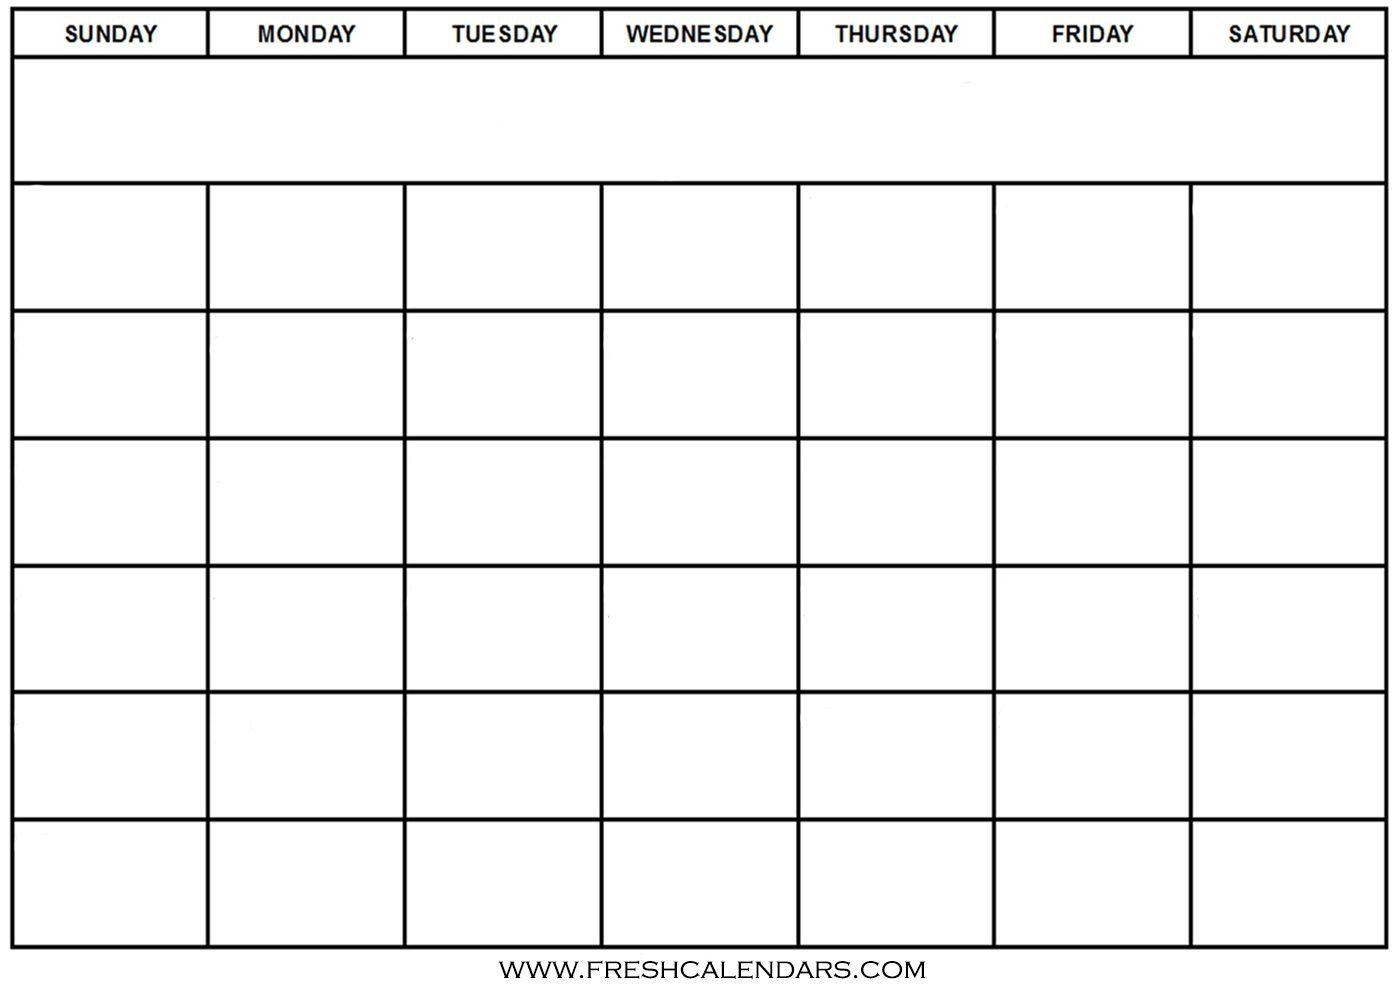 Free Printable Calendar That I Can Edit | Ten Free Free Calendars That I Can Edit And Print